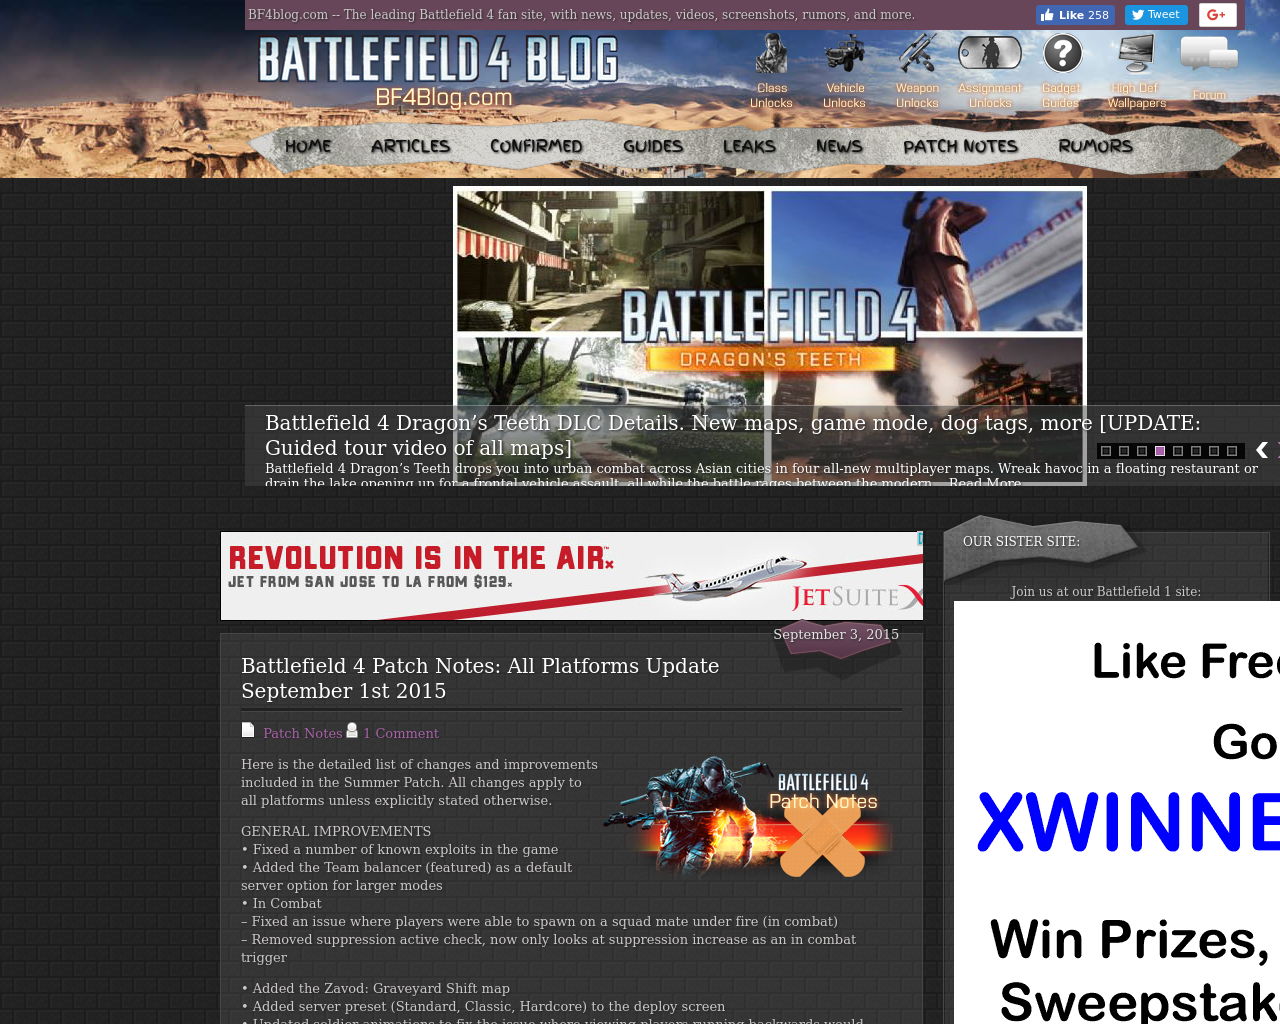 Battlefield-4-Blog-Advertising-Reviews-Pricing